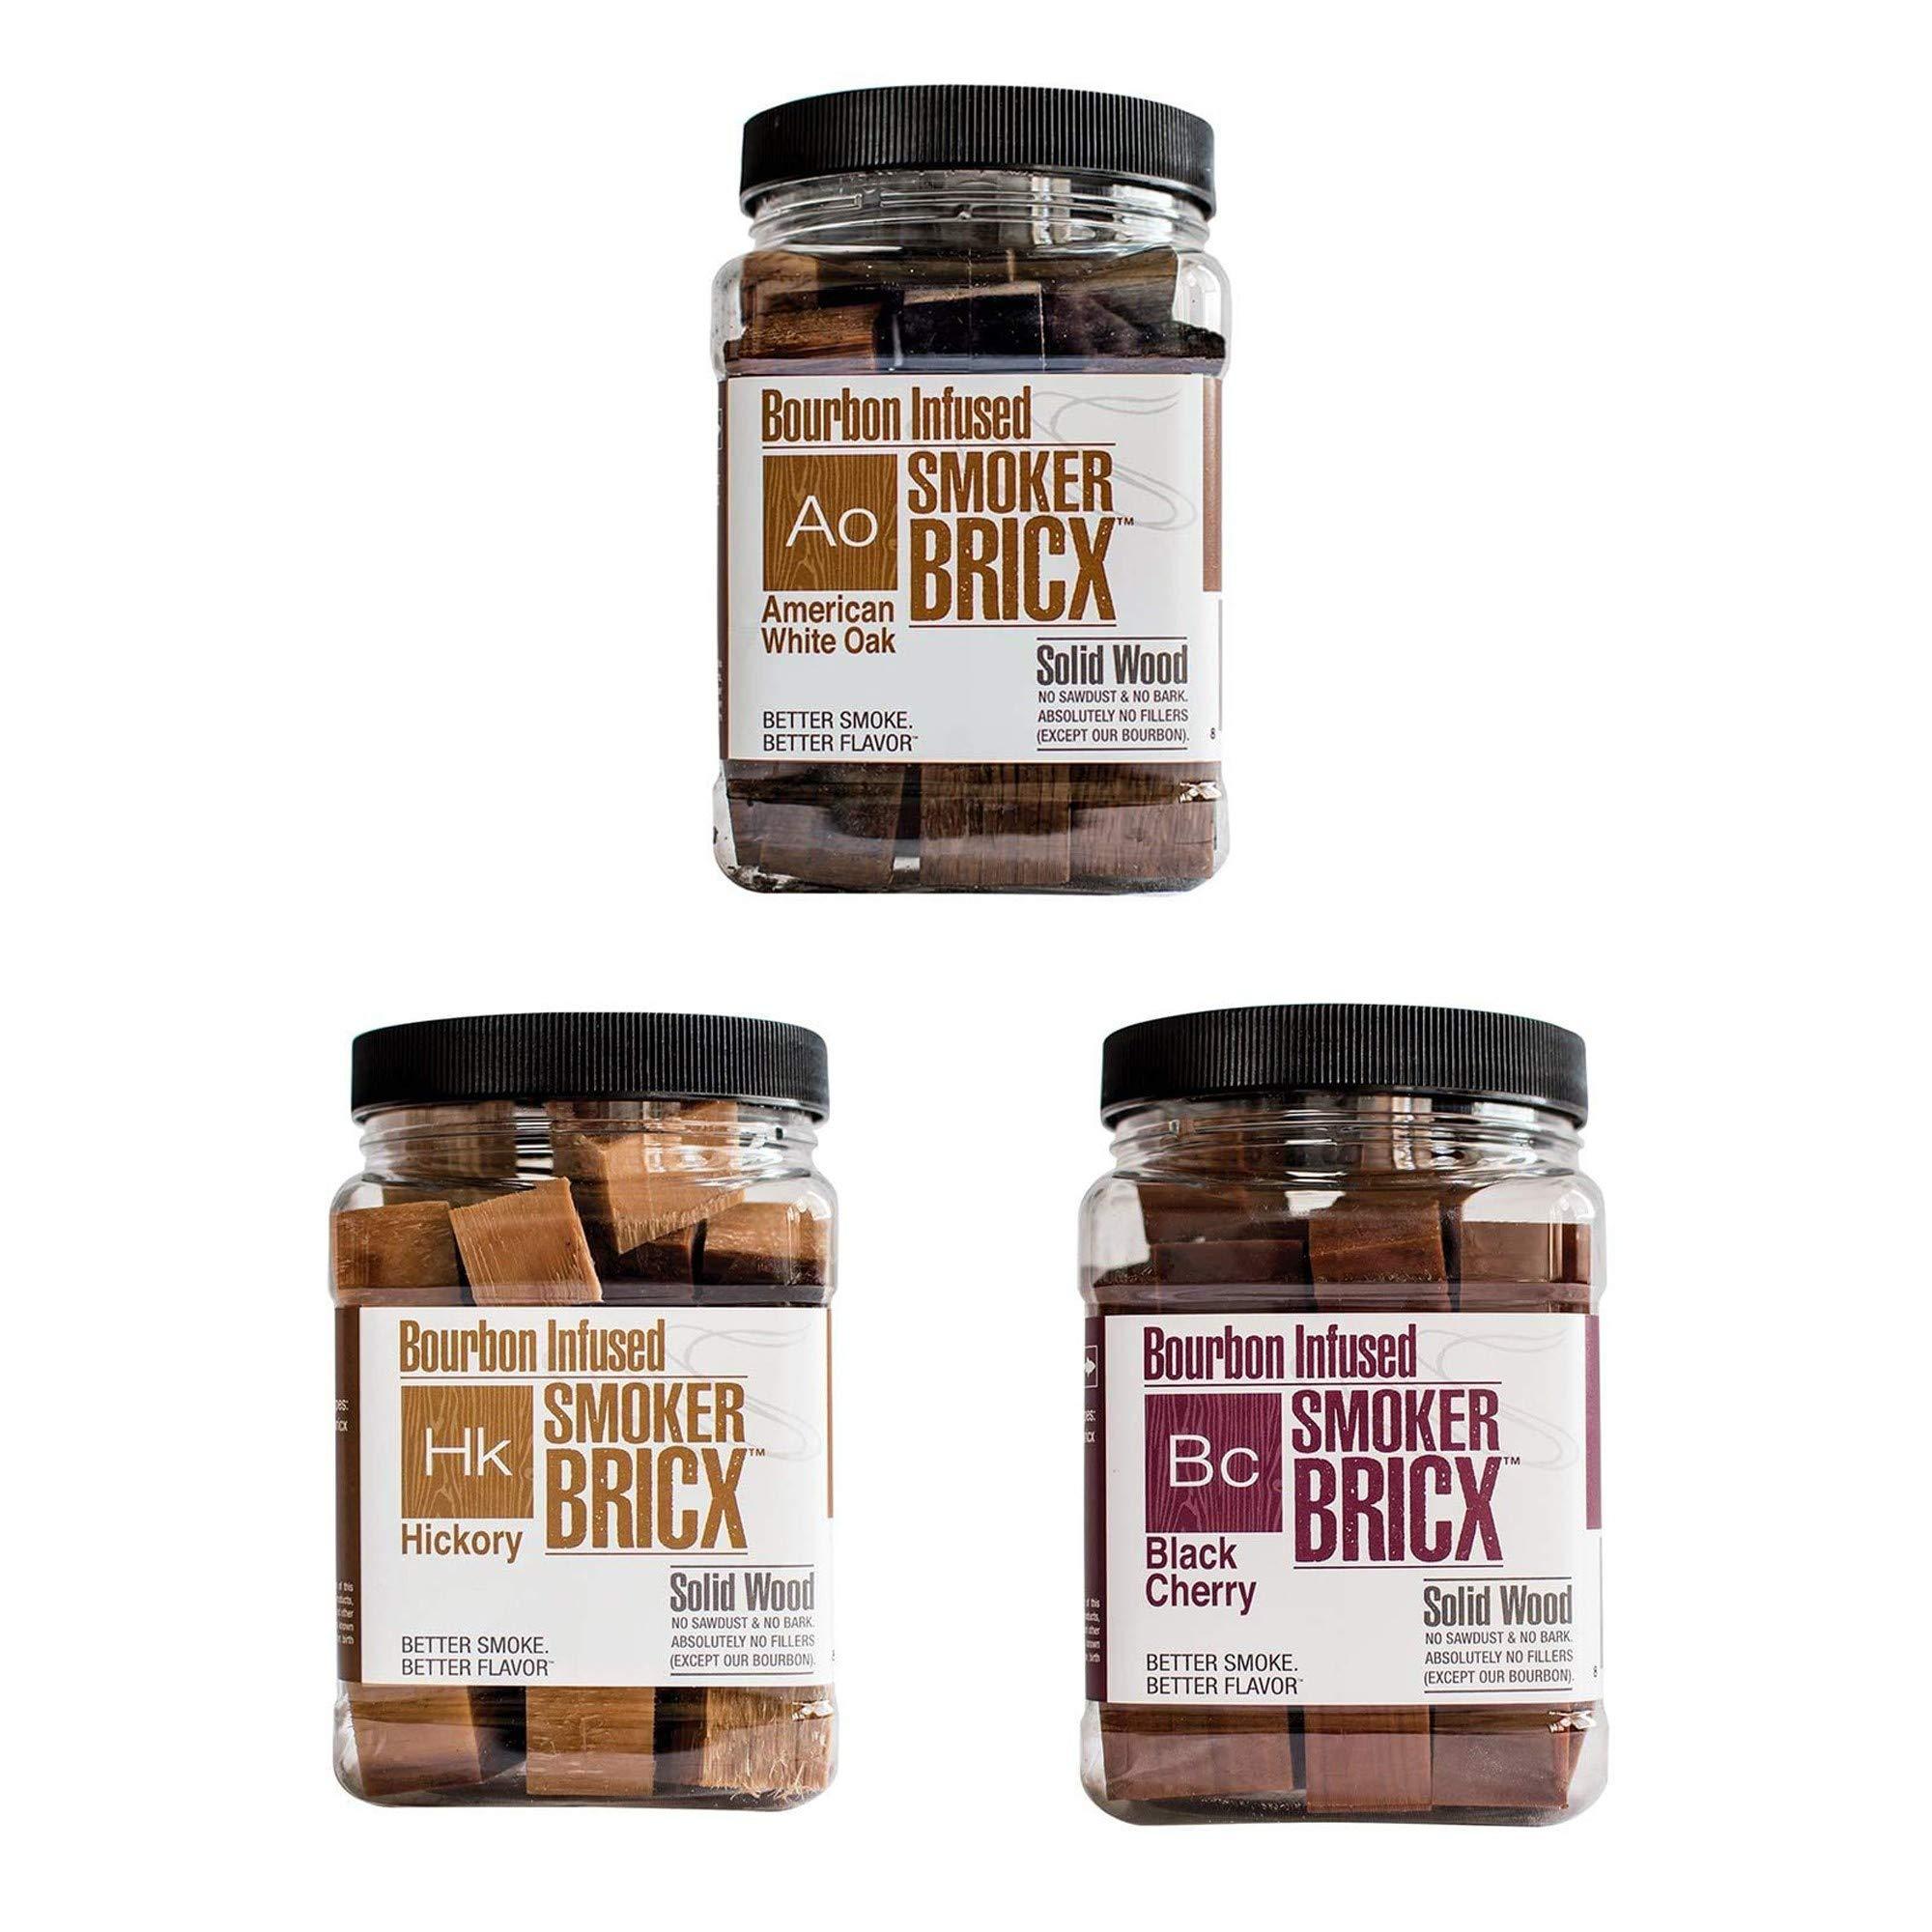 Smoker Bricx Bourbon Infused BBQ Smoking Chunks 32oz, 3 Pack - American Oak, Black Cherry, and Hickory